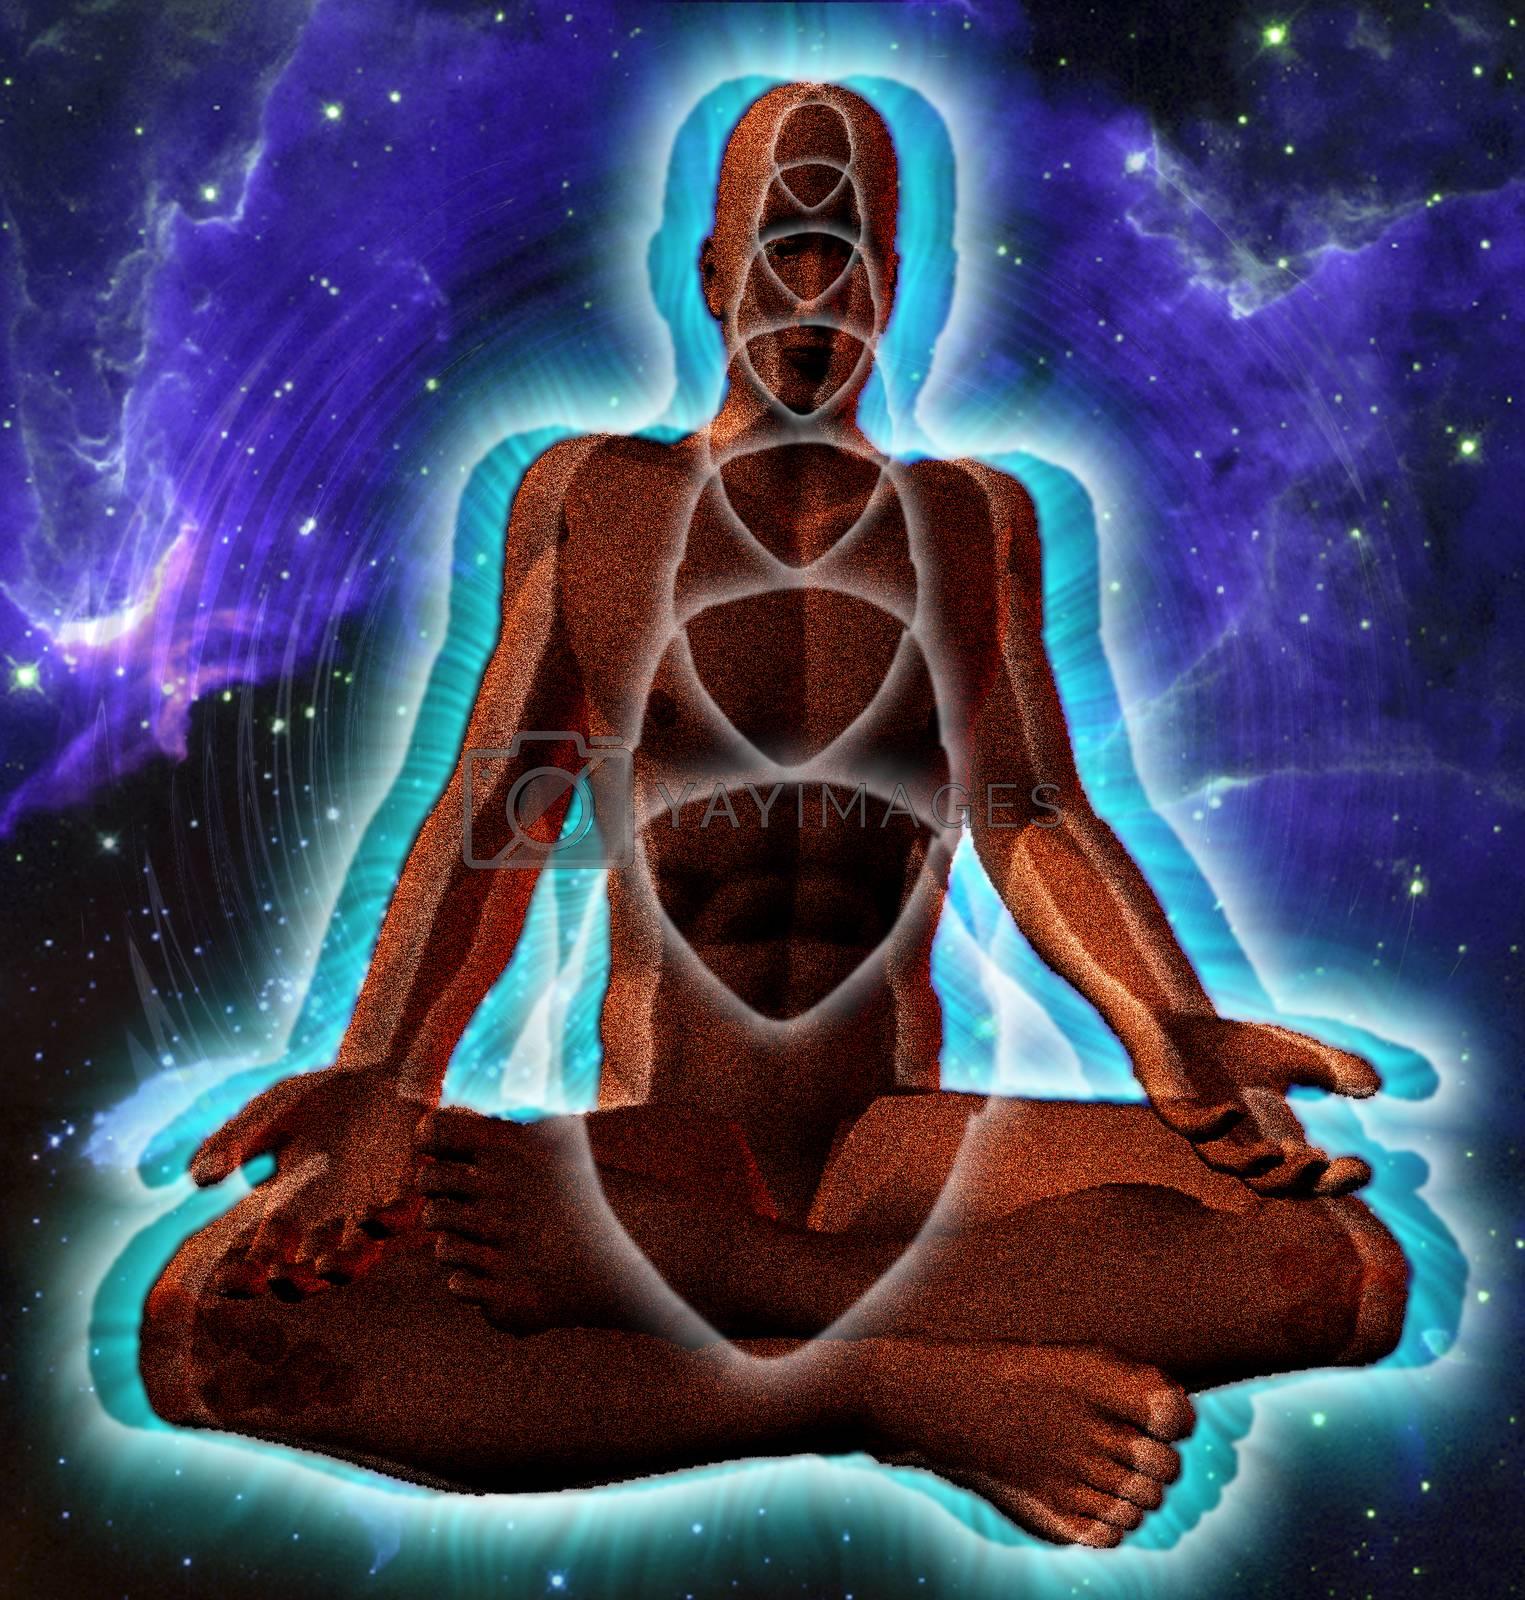 Man meditate in lotus pose. Space background